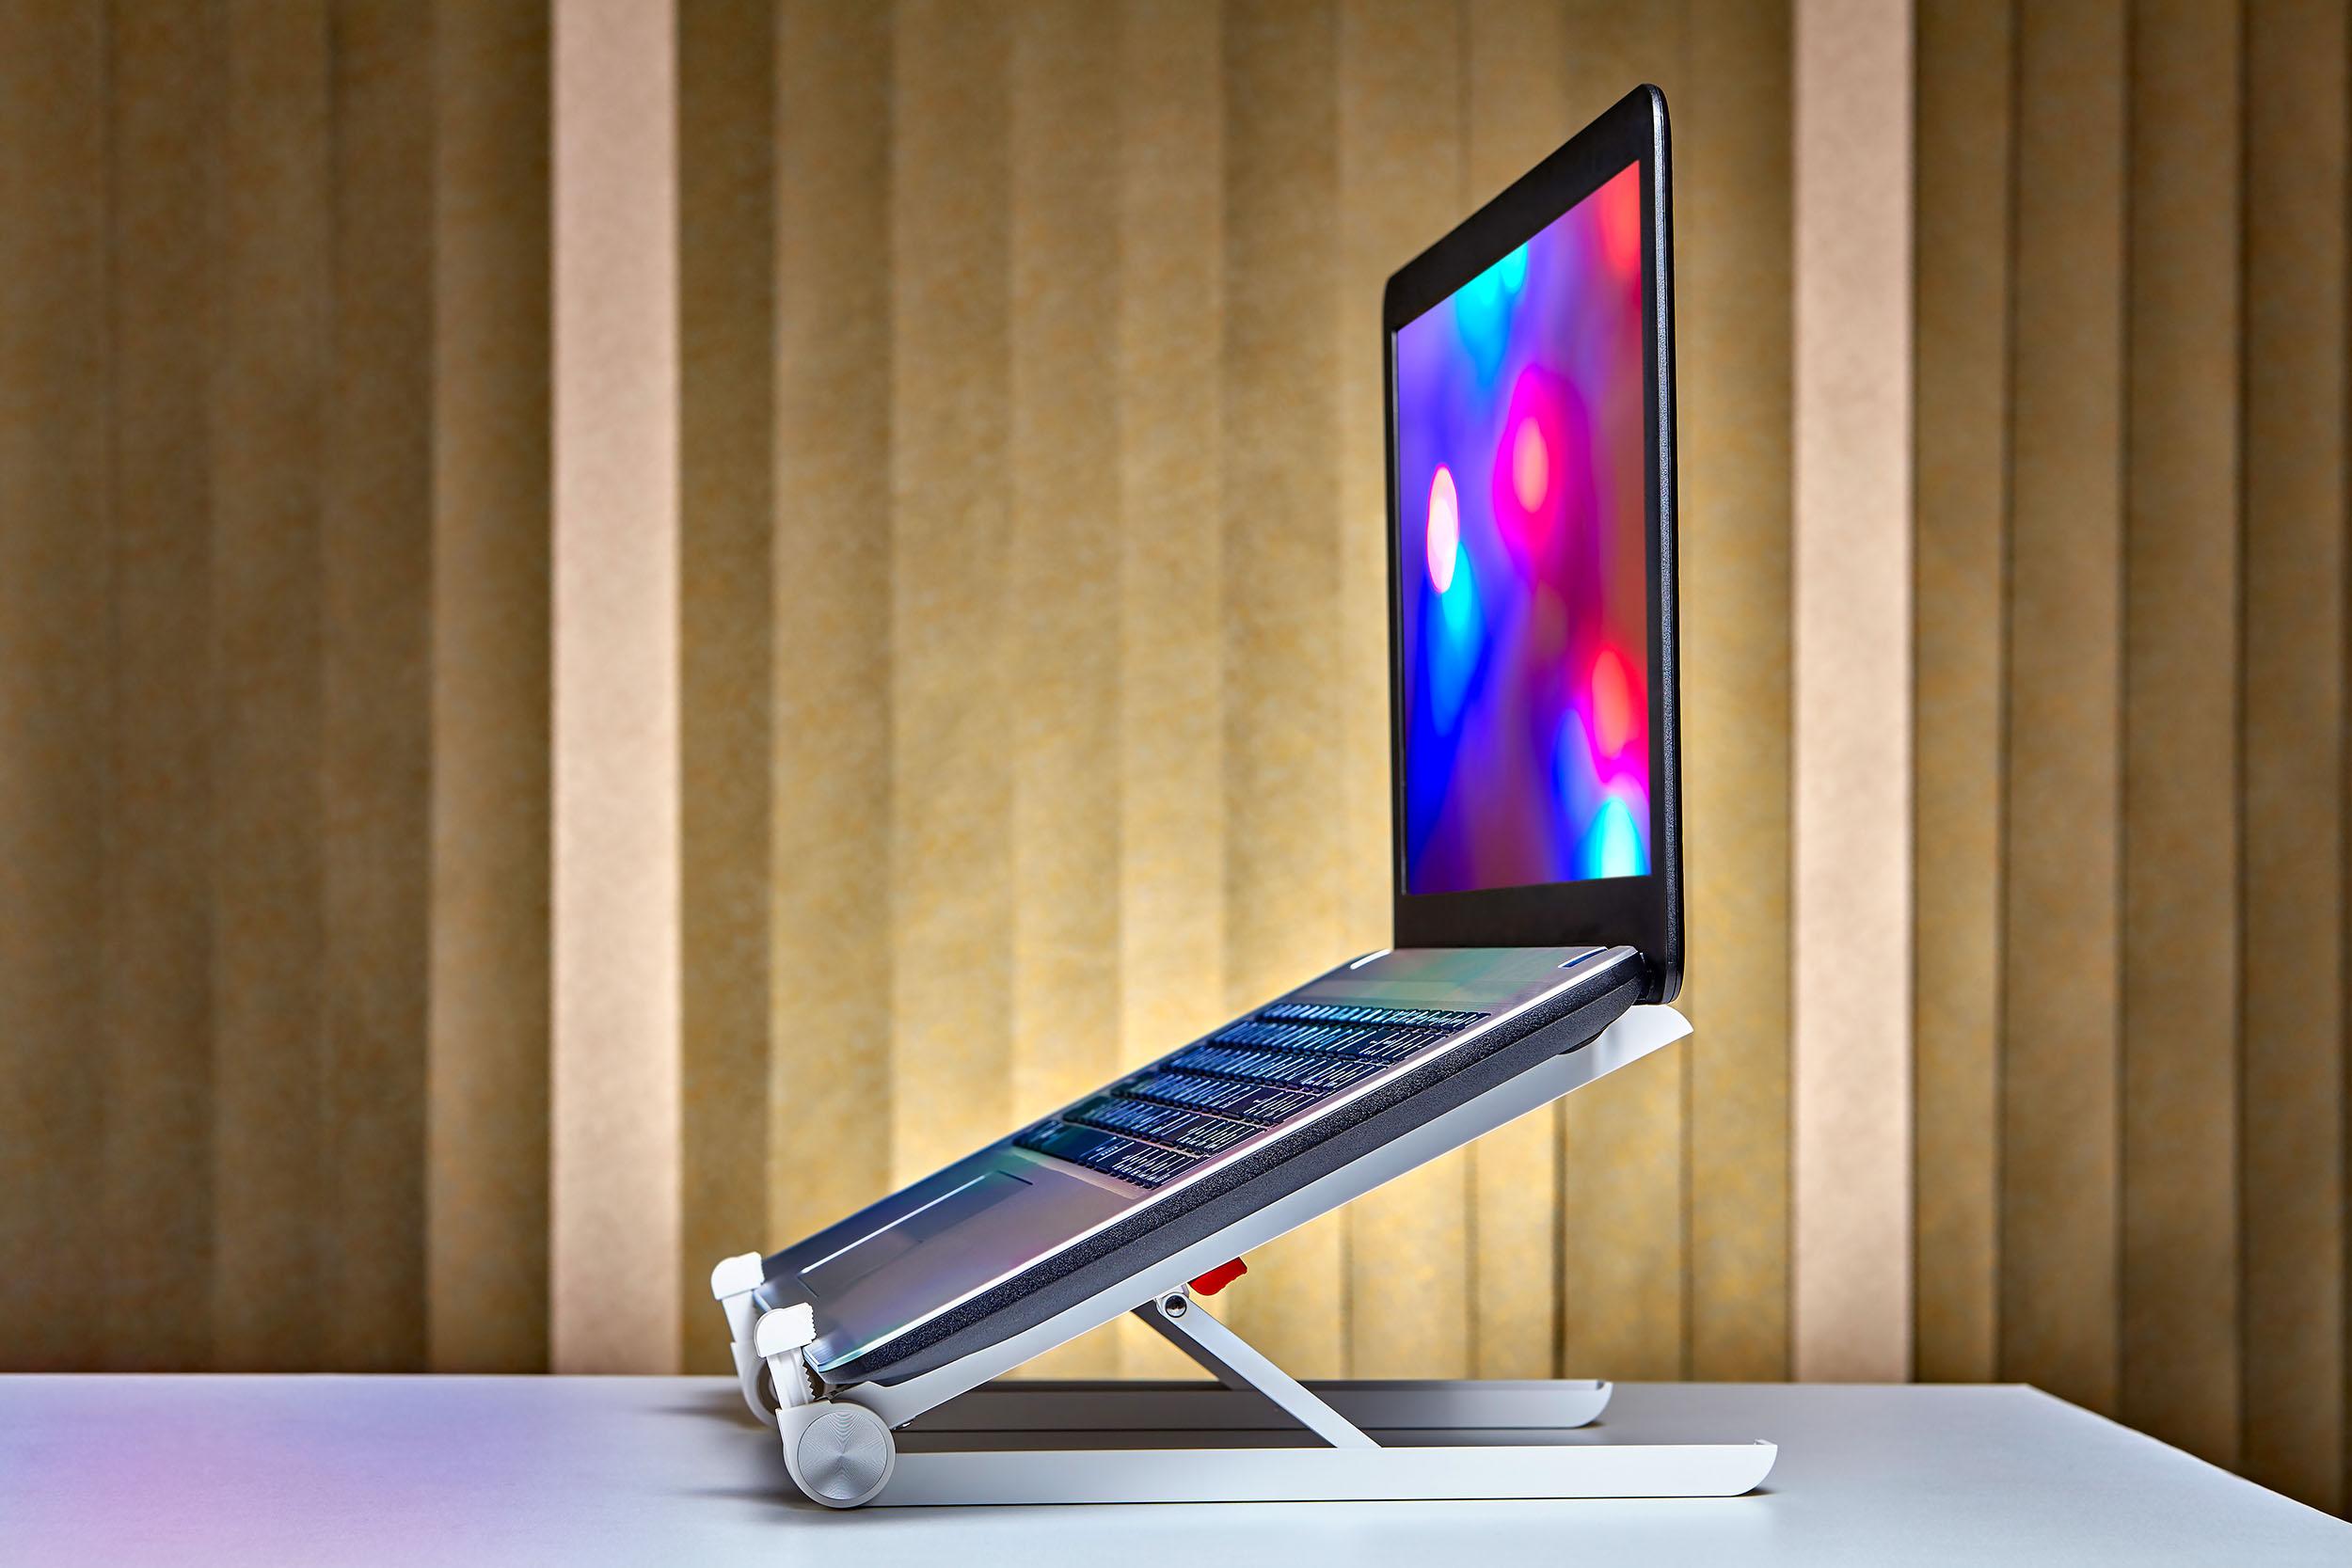 Standing Laptop Holder